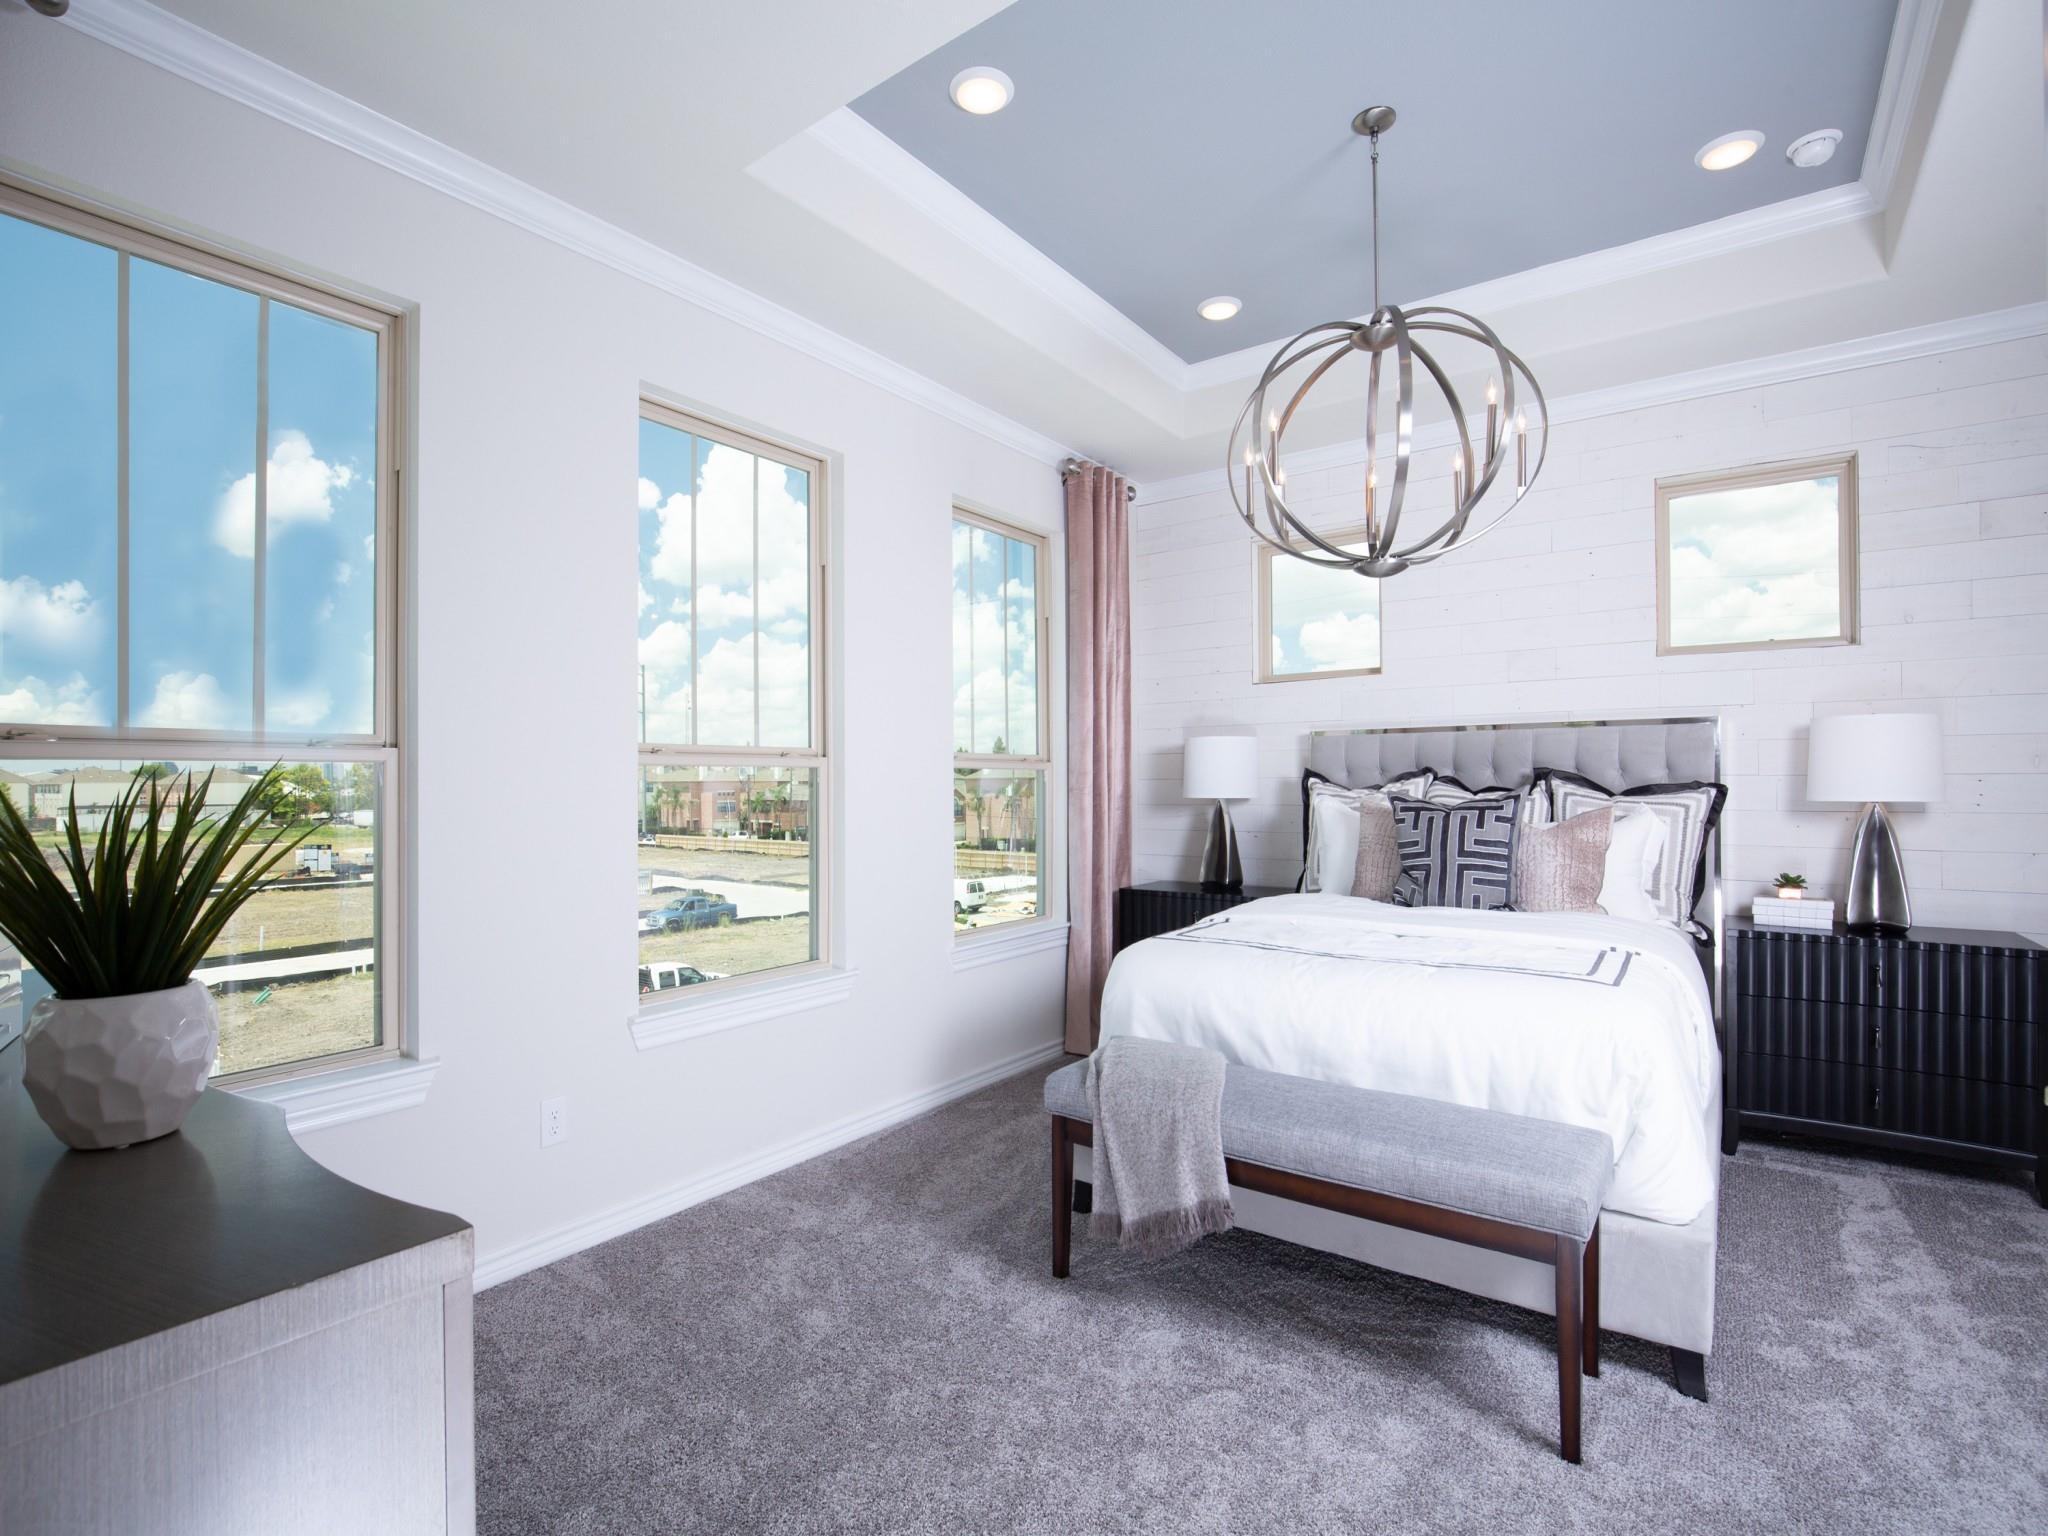 3406 Avondale View Drive Property Photo - Houston, TX real estate listing